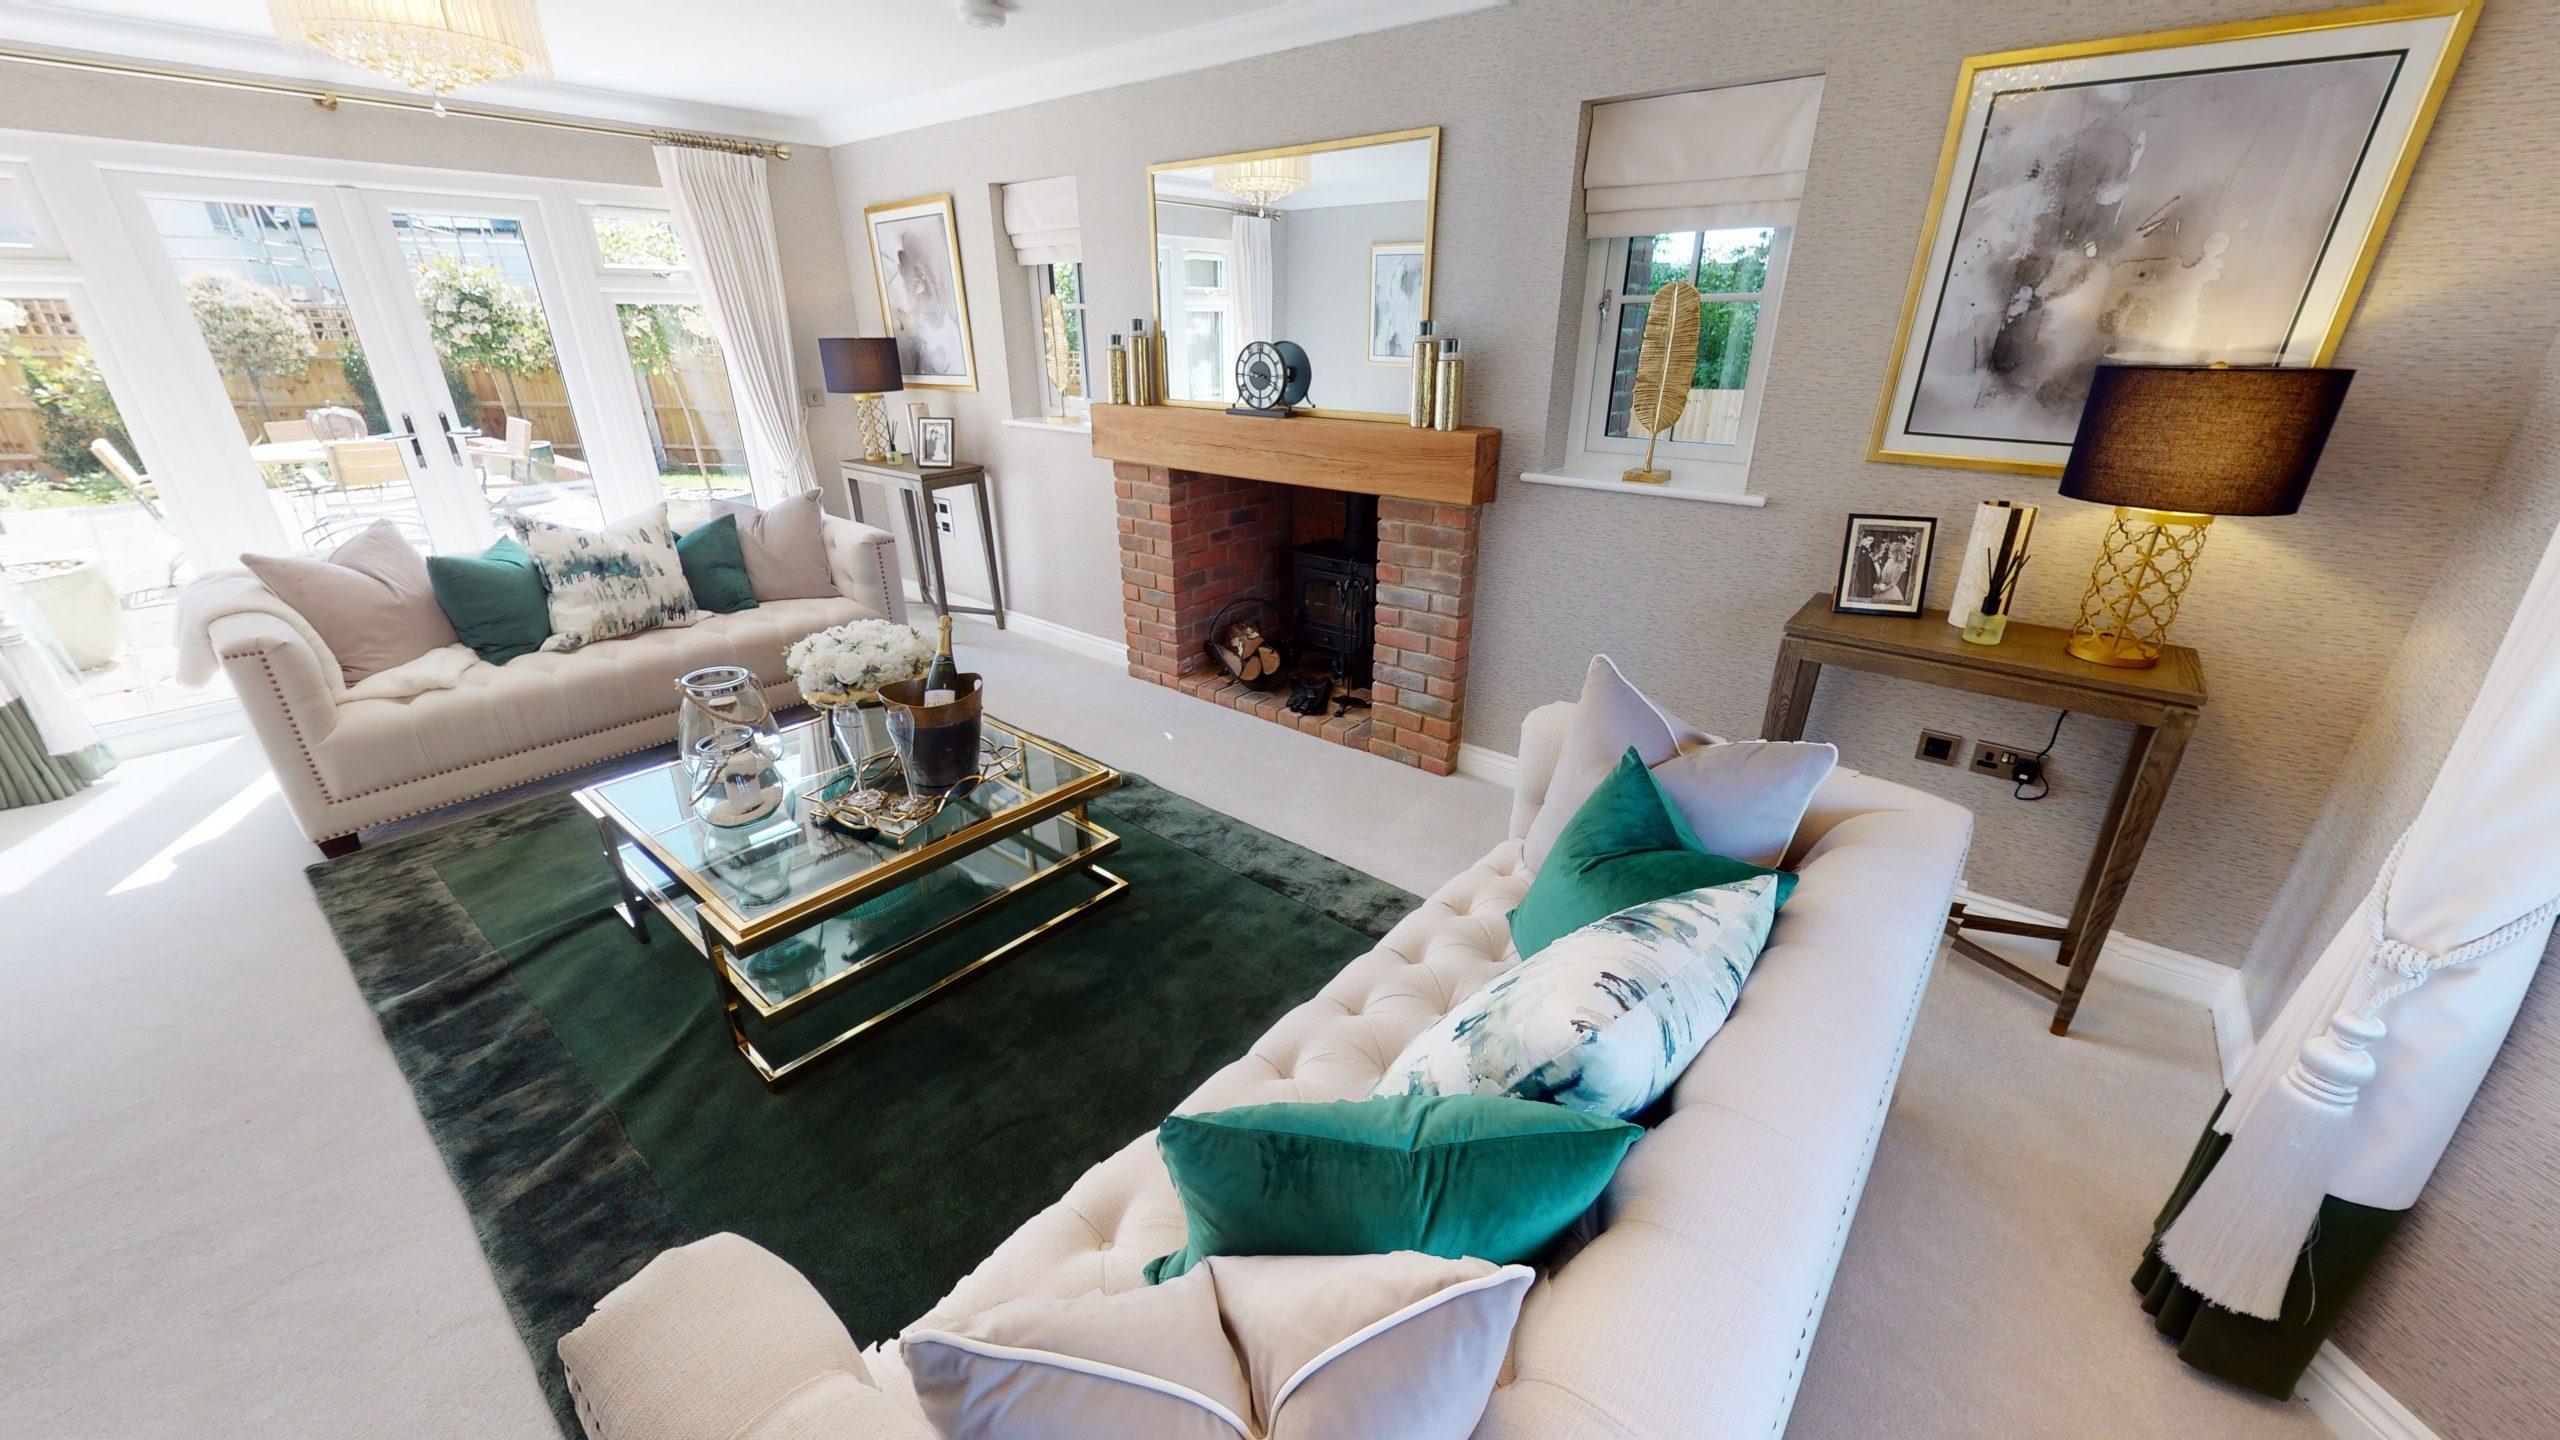 hawthornden yalding living room